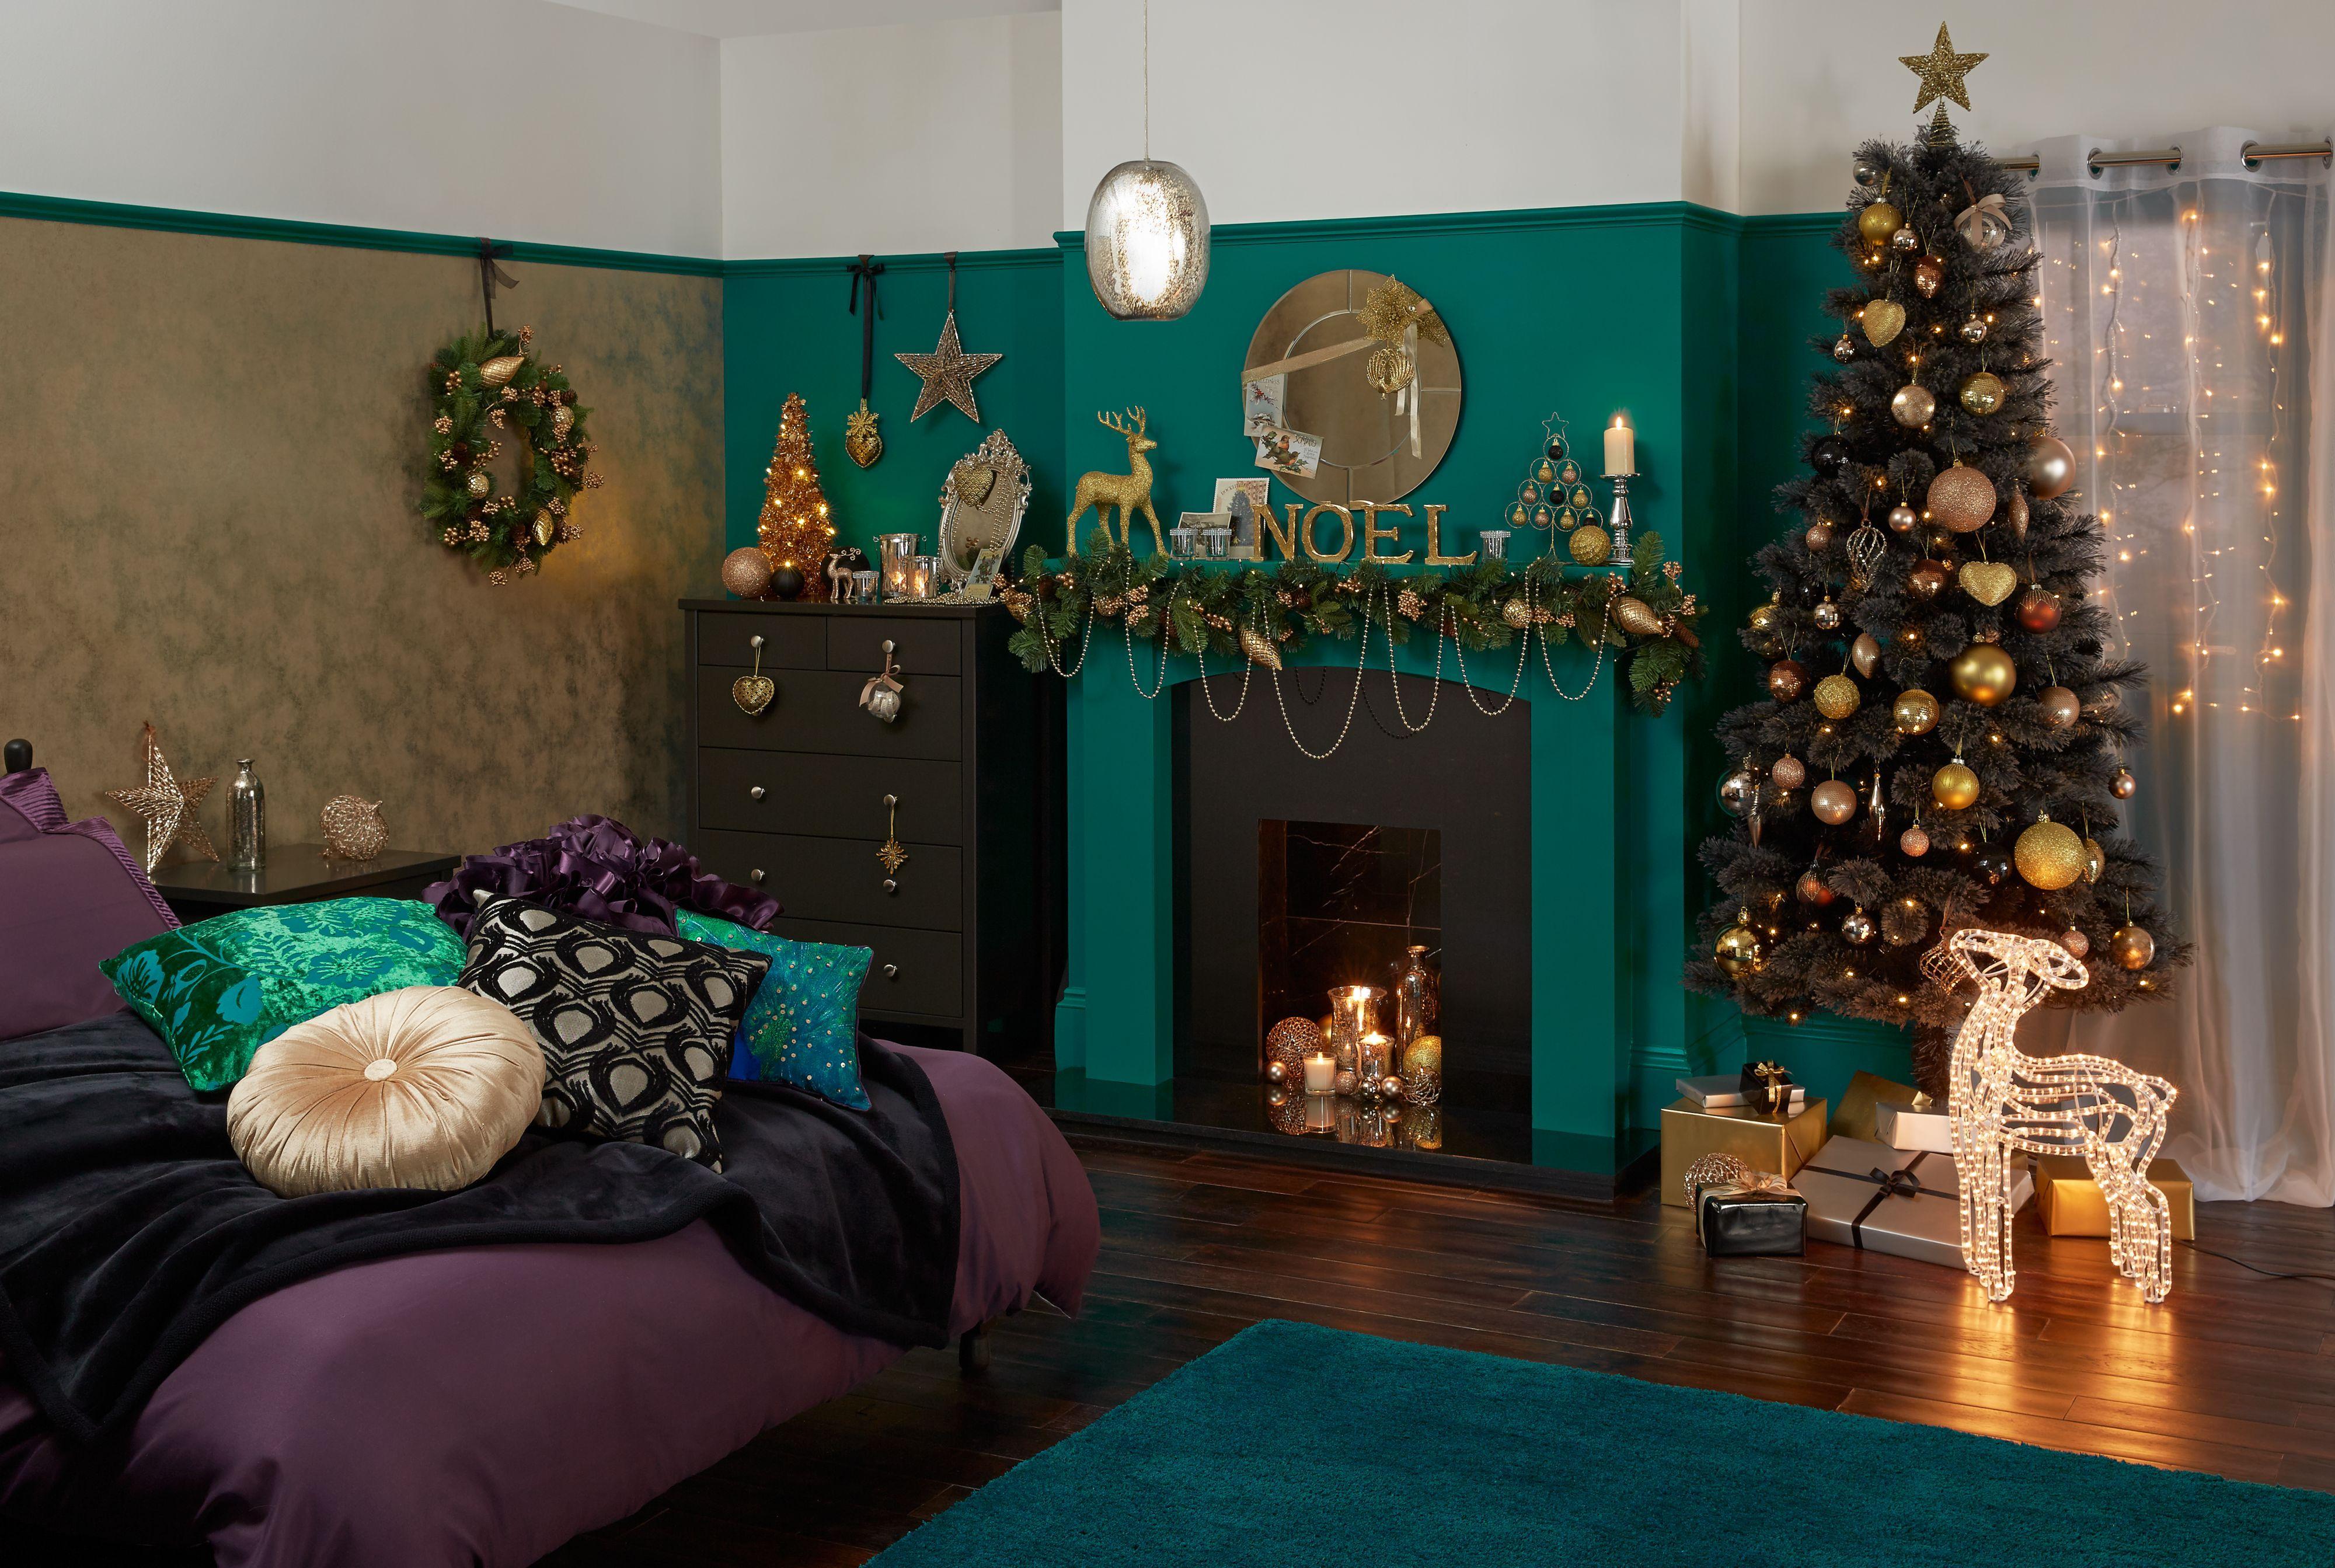 Preparing for guests this Christmas | Inspiration | DIY at B&Q